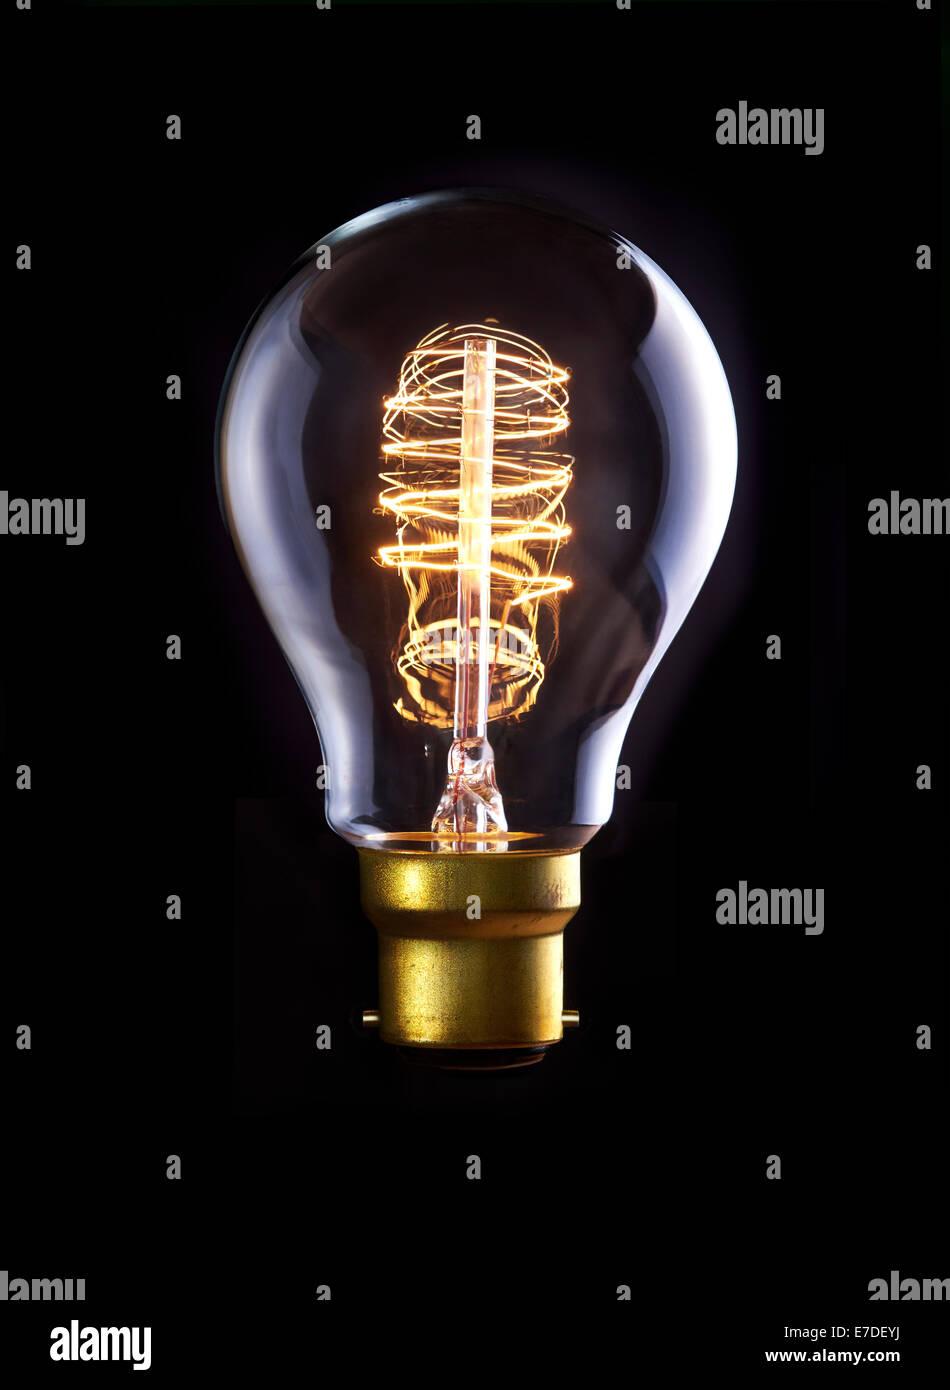 Un clásico Edison lámpara con un filamento de bucle. Encendido. Imagen De Stock